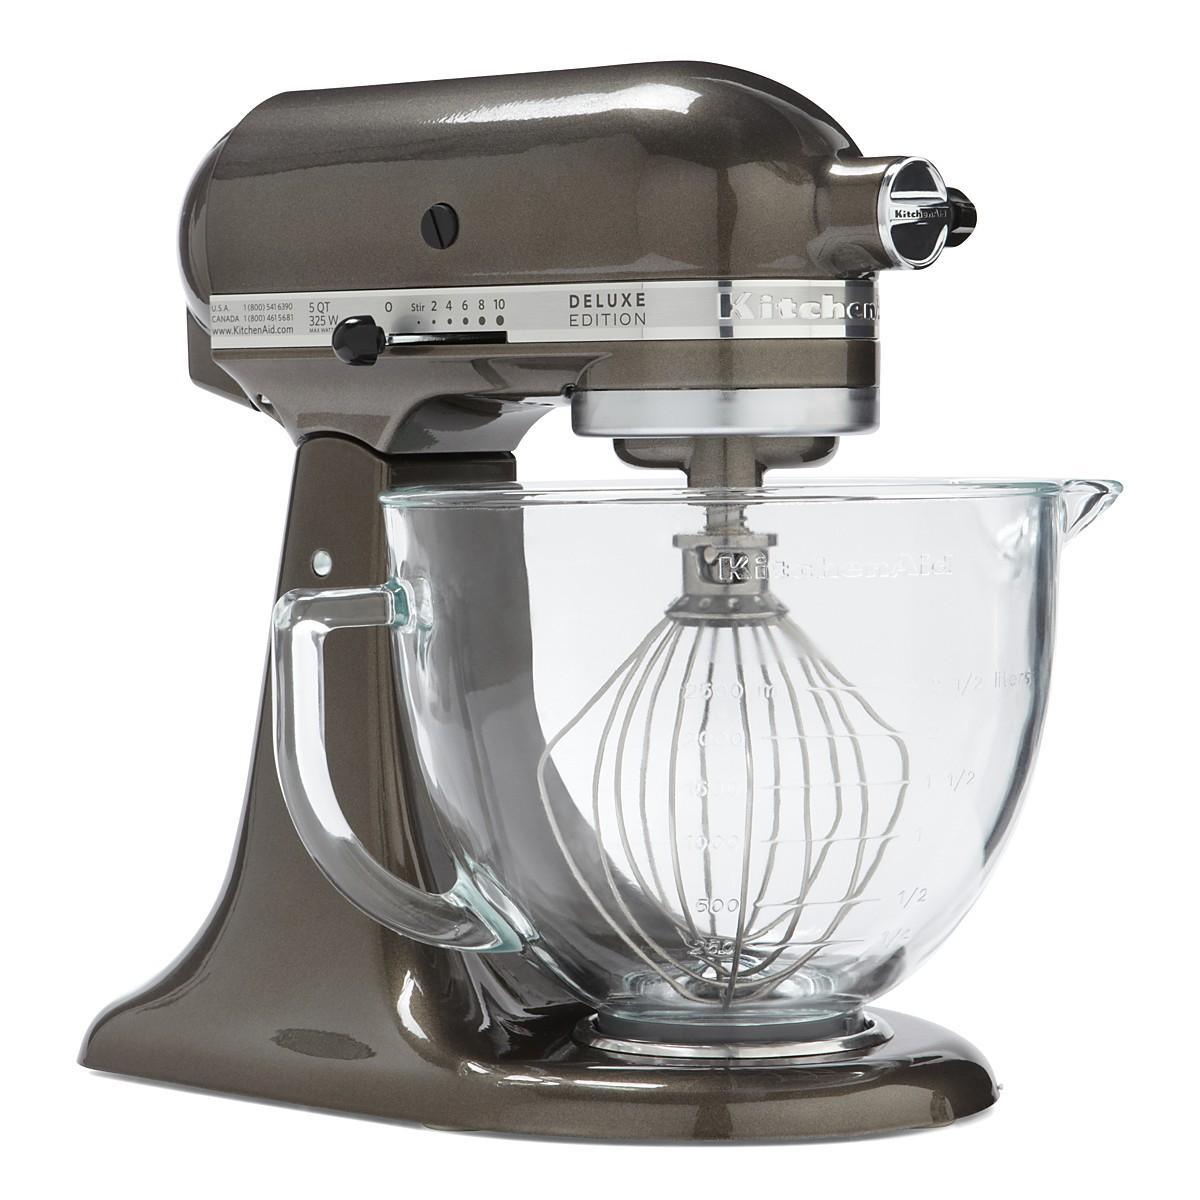 KitchenAid Artisan Design 5-Quart Stand Mixer with Glass Bowl ...